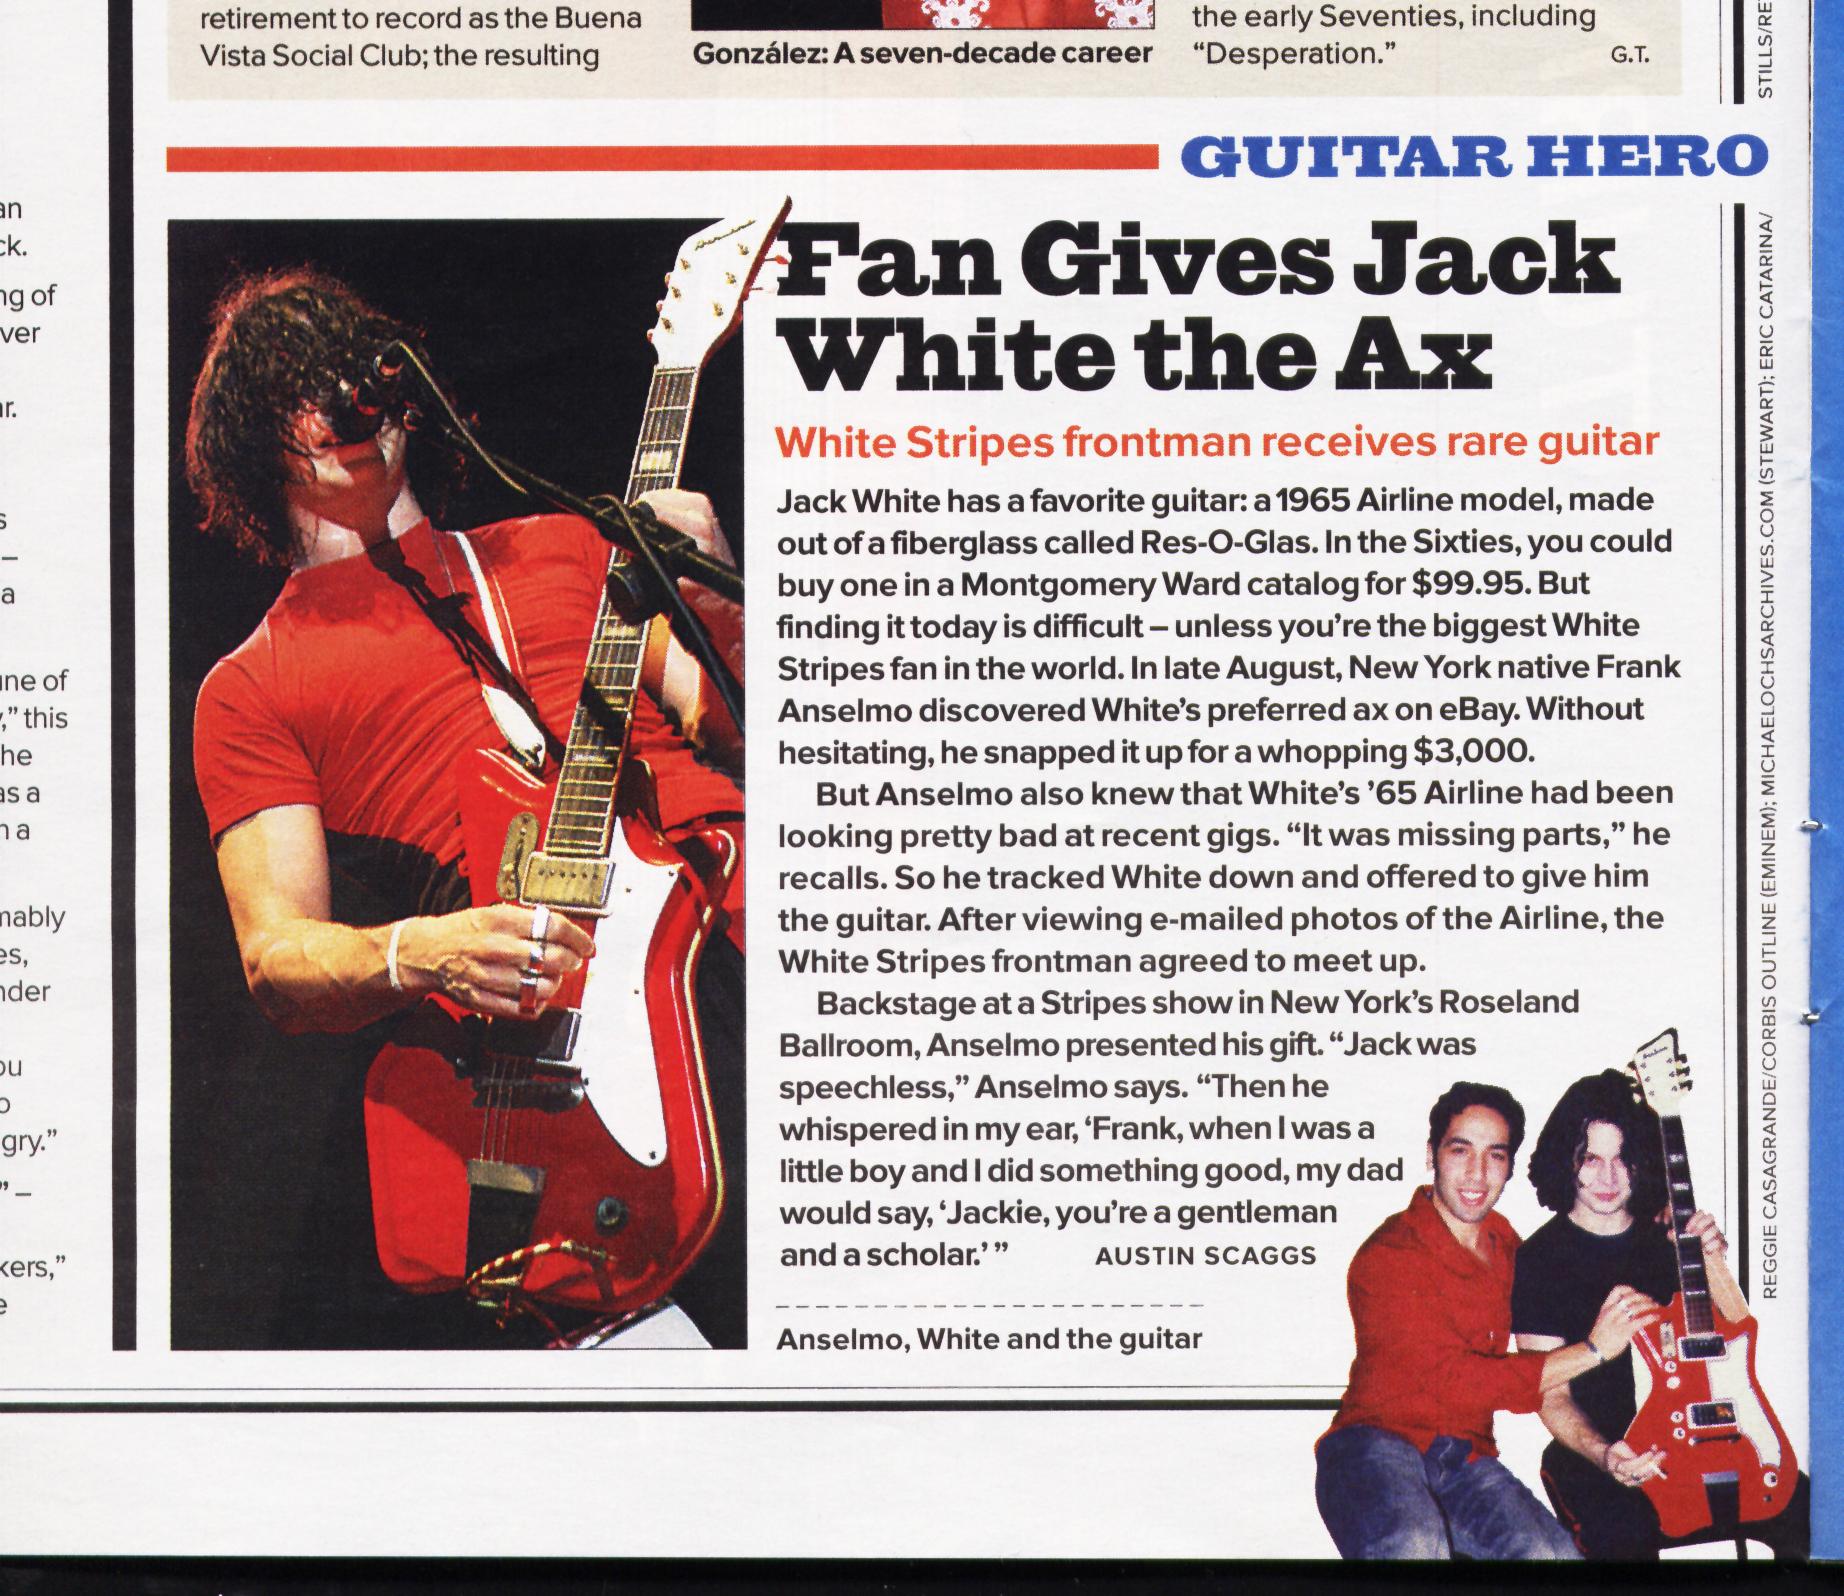 frank anselmo jack white stripes rolling stone magazine mojo magazine